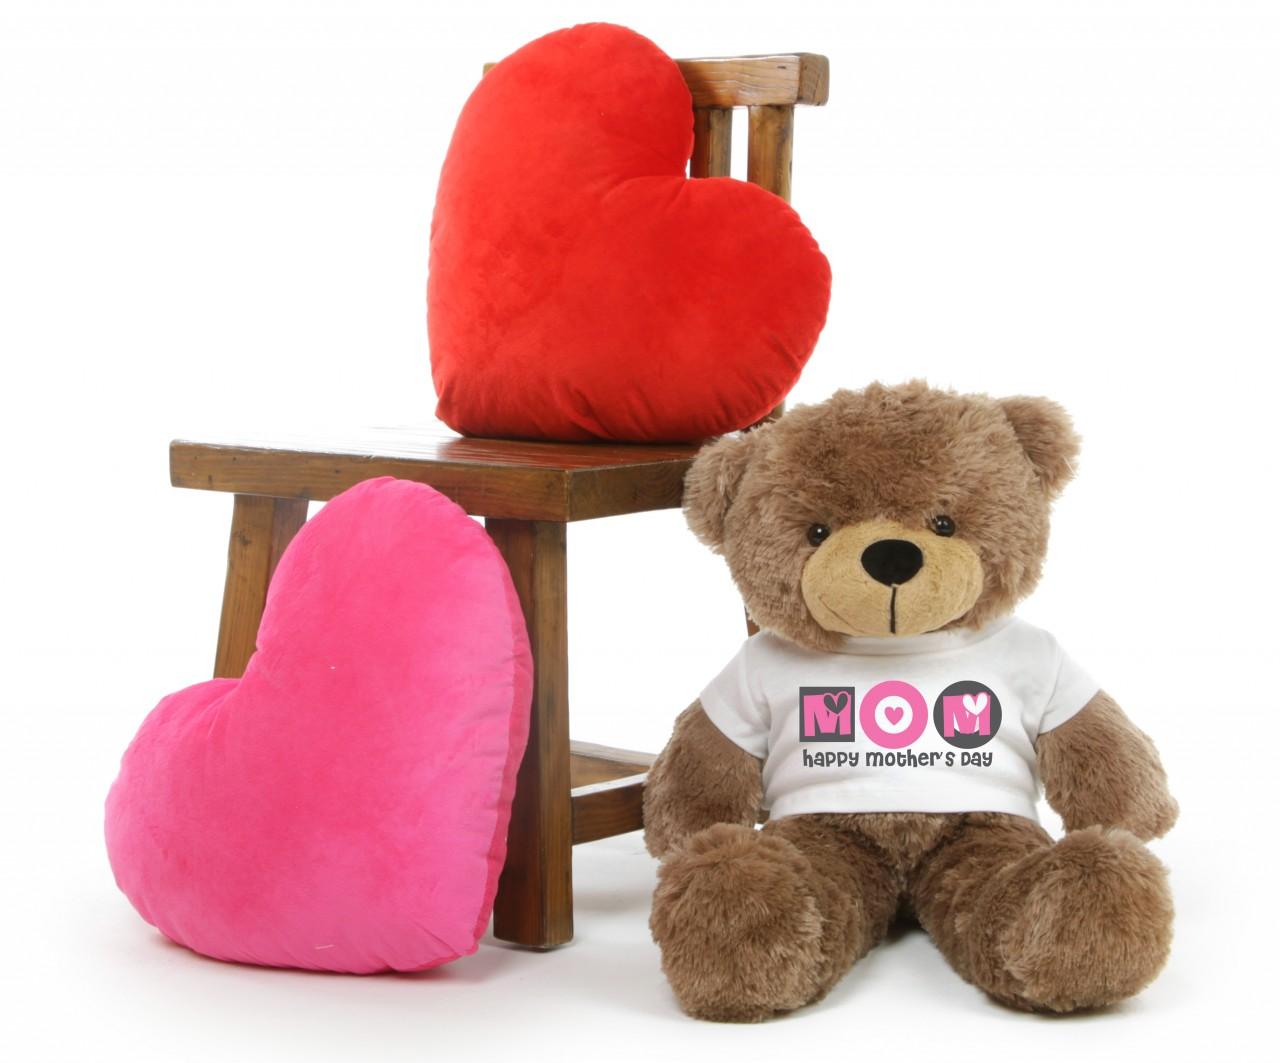 Sunny M Cuddles Mocha Mothers Day Teddy Bear Gift 26in